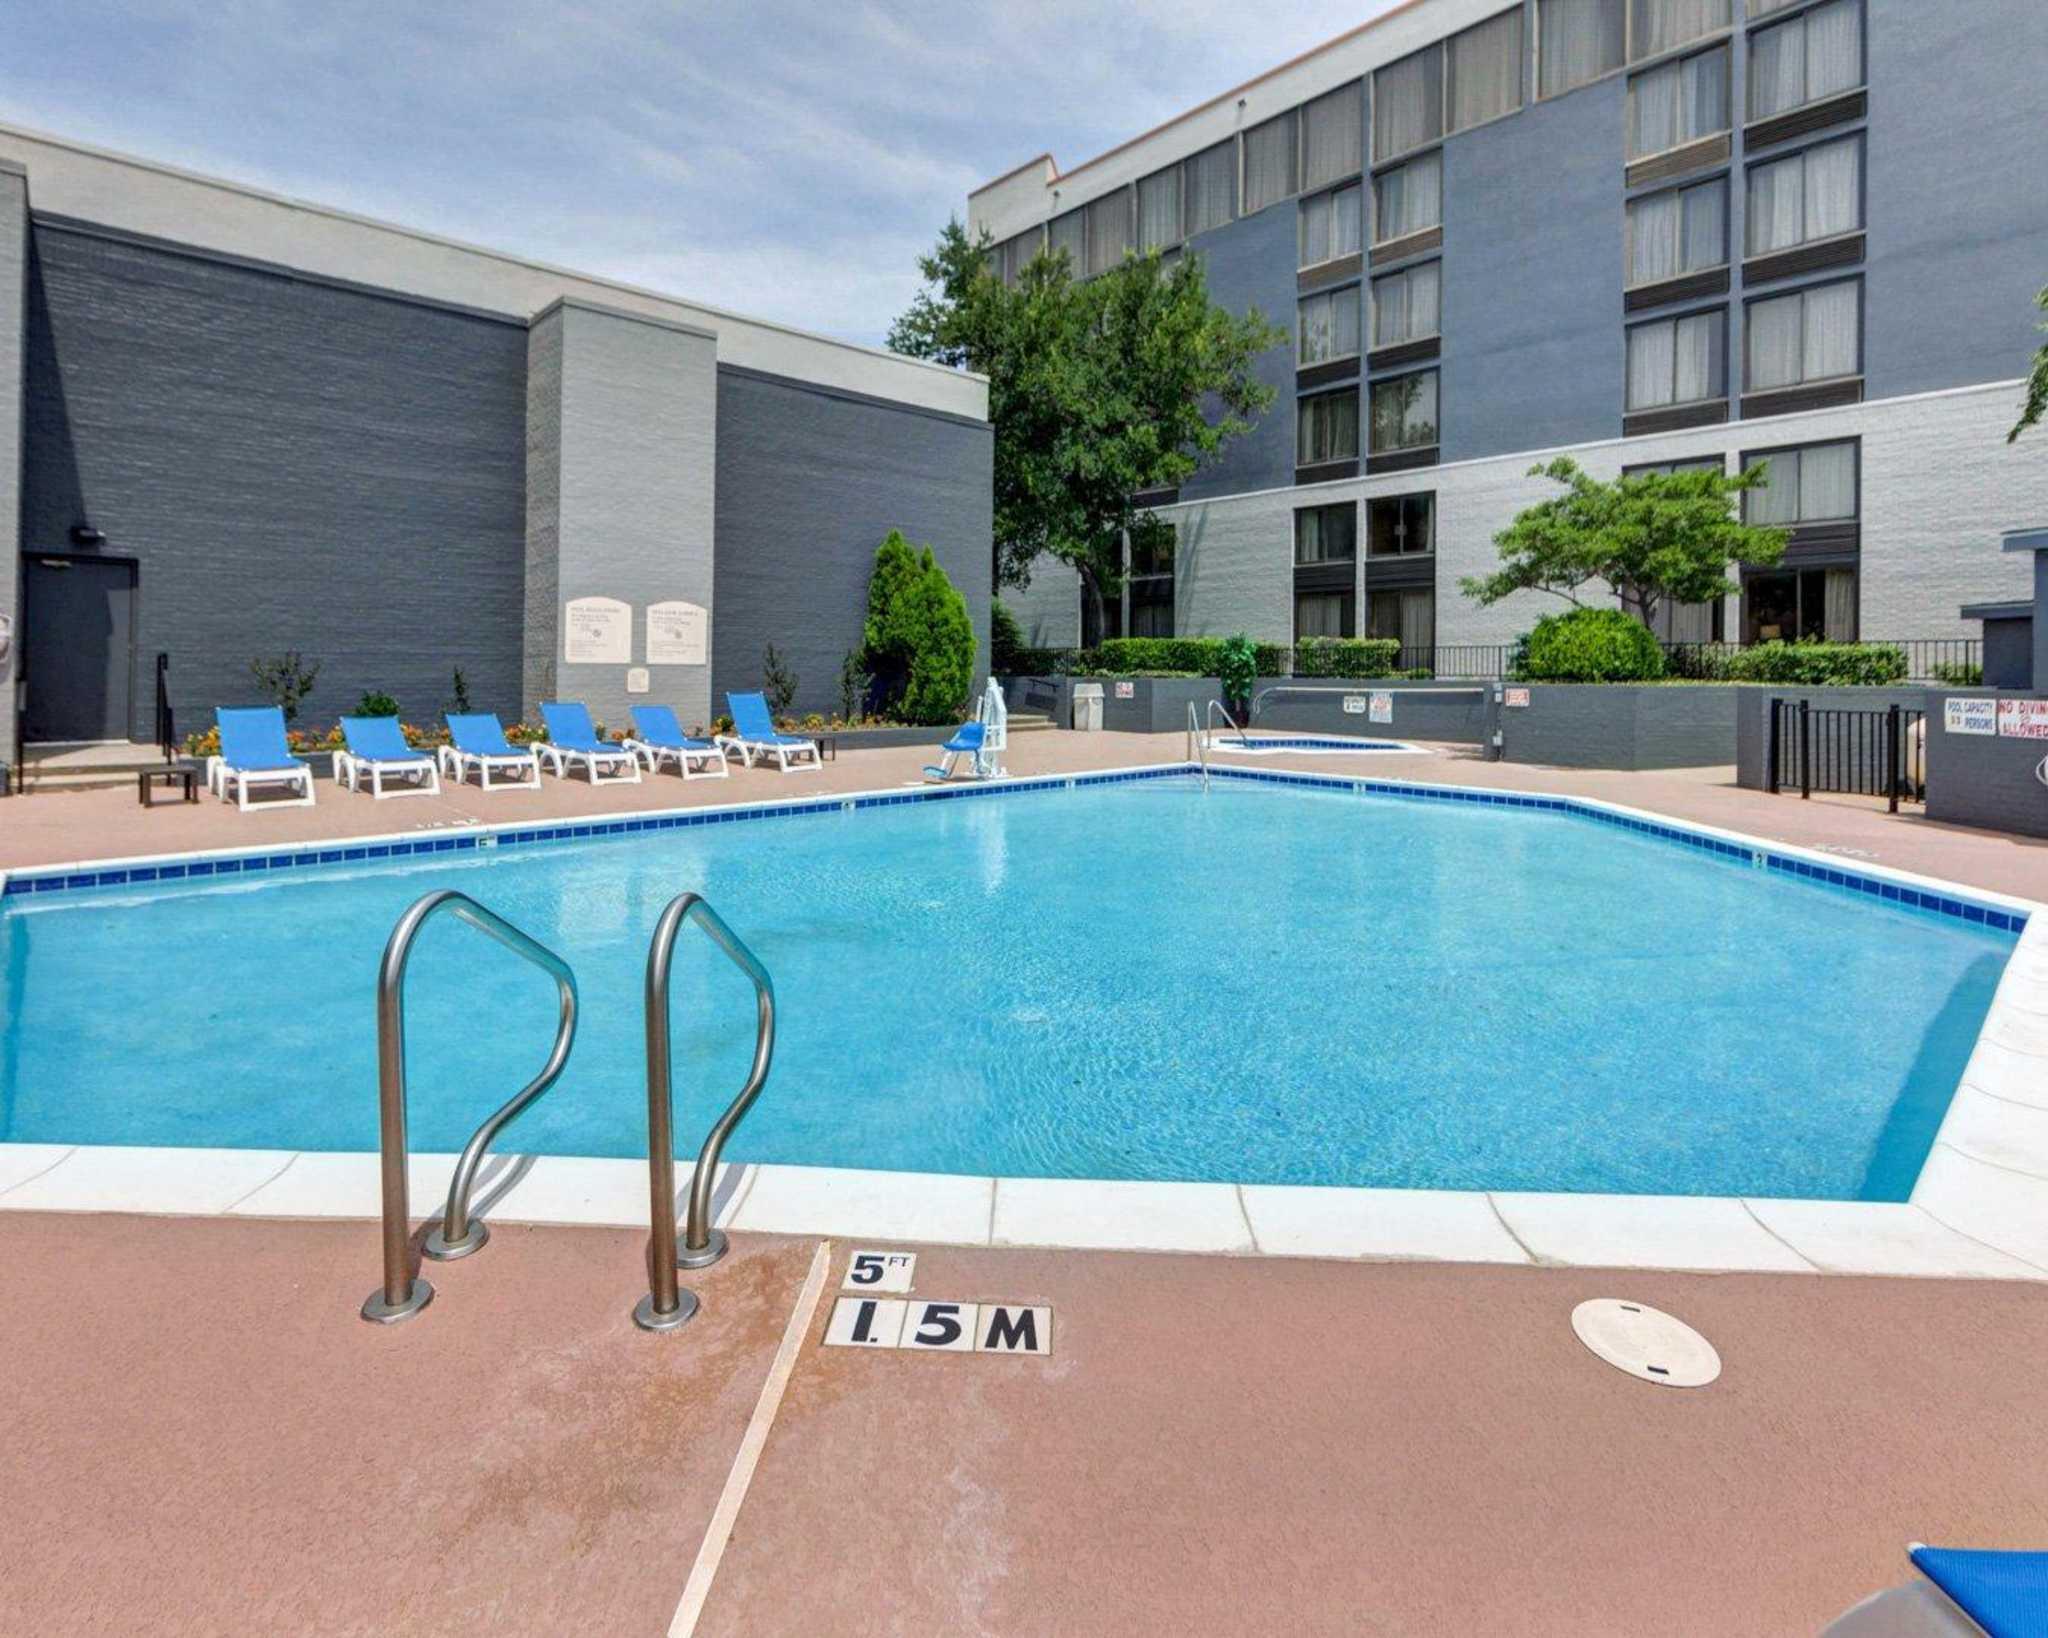 Comfort Inn & Suites Plano East image 12